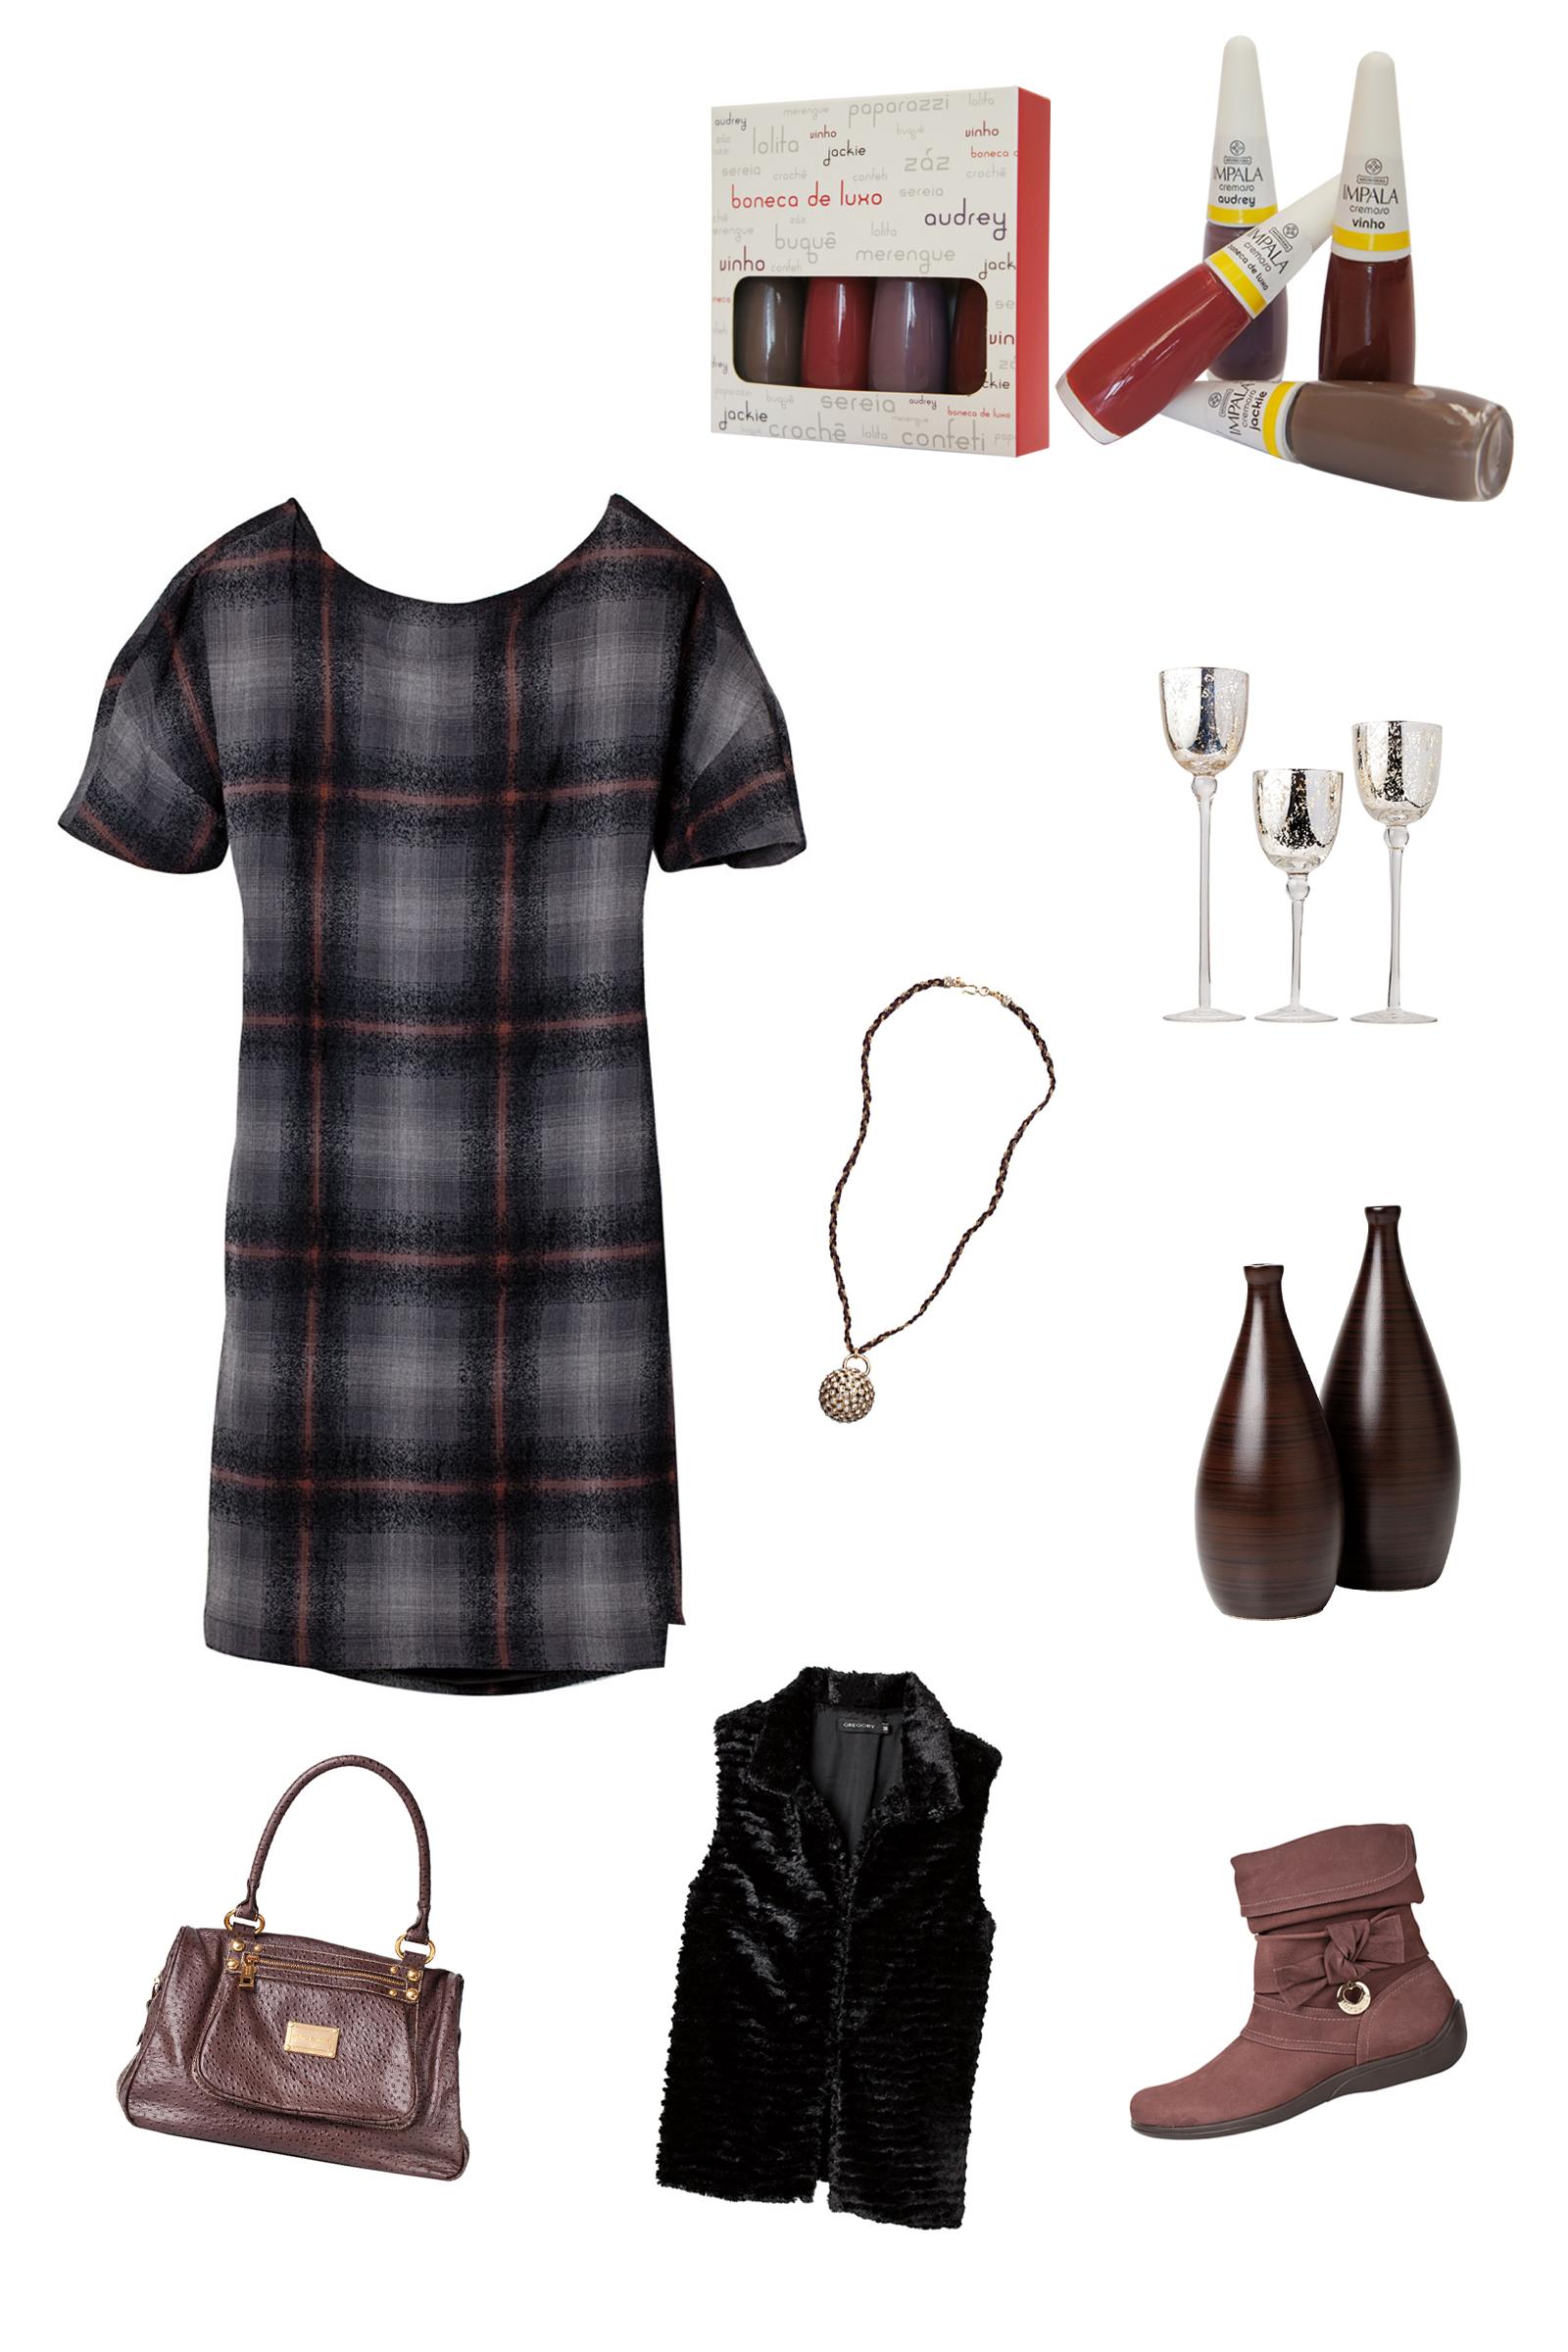 Arquivos Moda - Página 6 de 24 - Conversa de Menina e0feabadbc